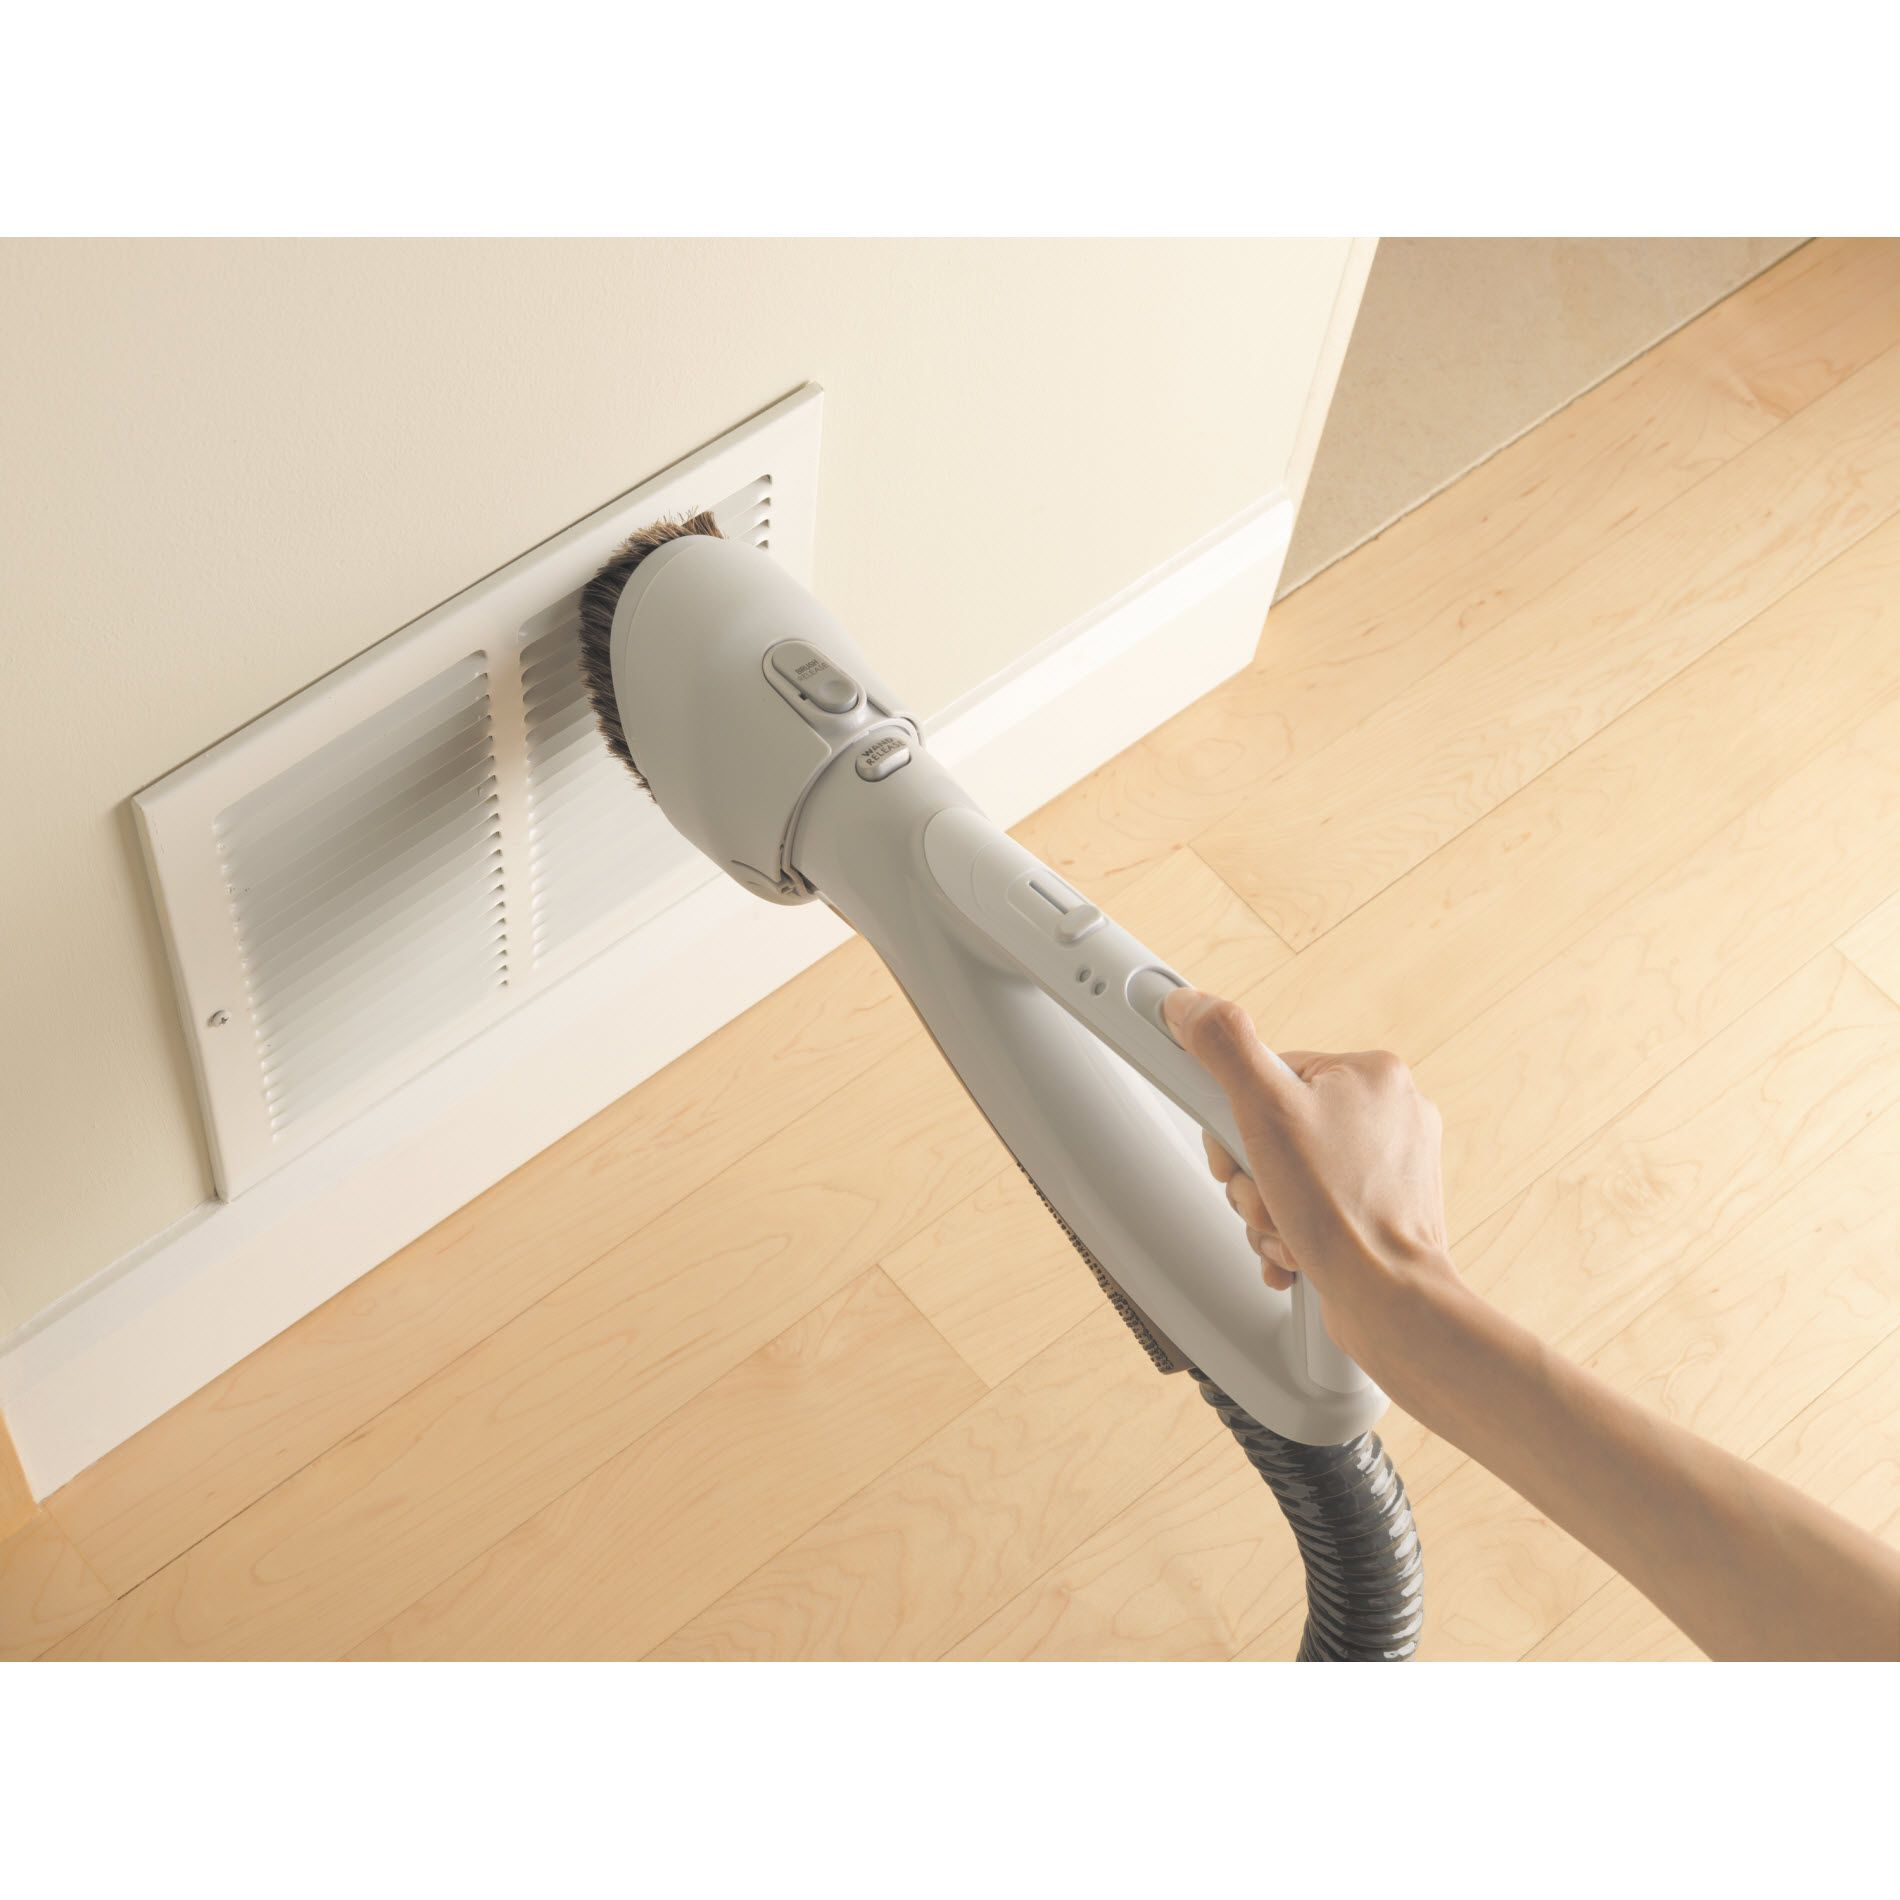 Kenmore 21514 Progressive Canister Vacuum Cleaner – White